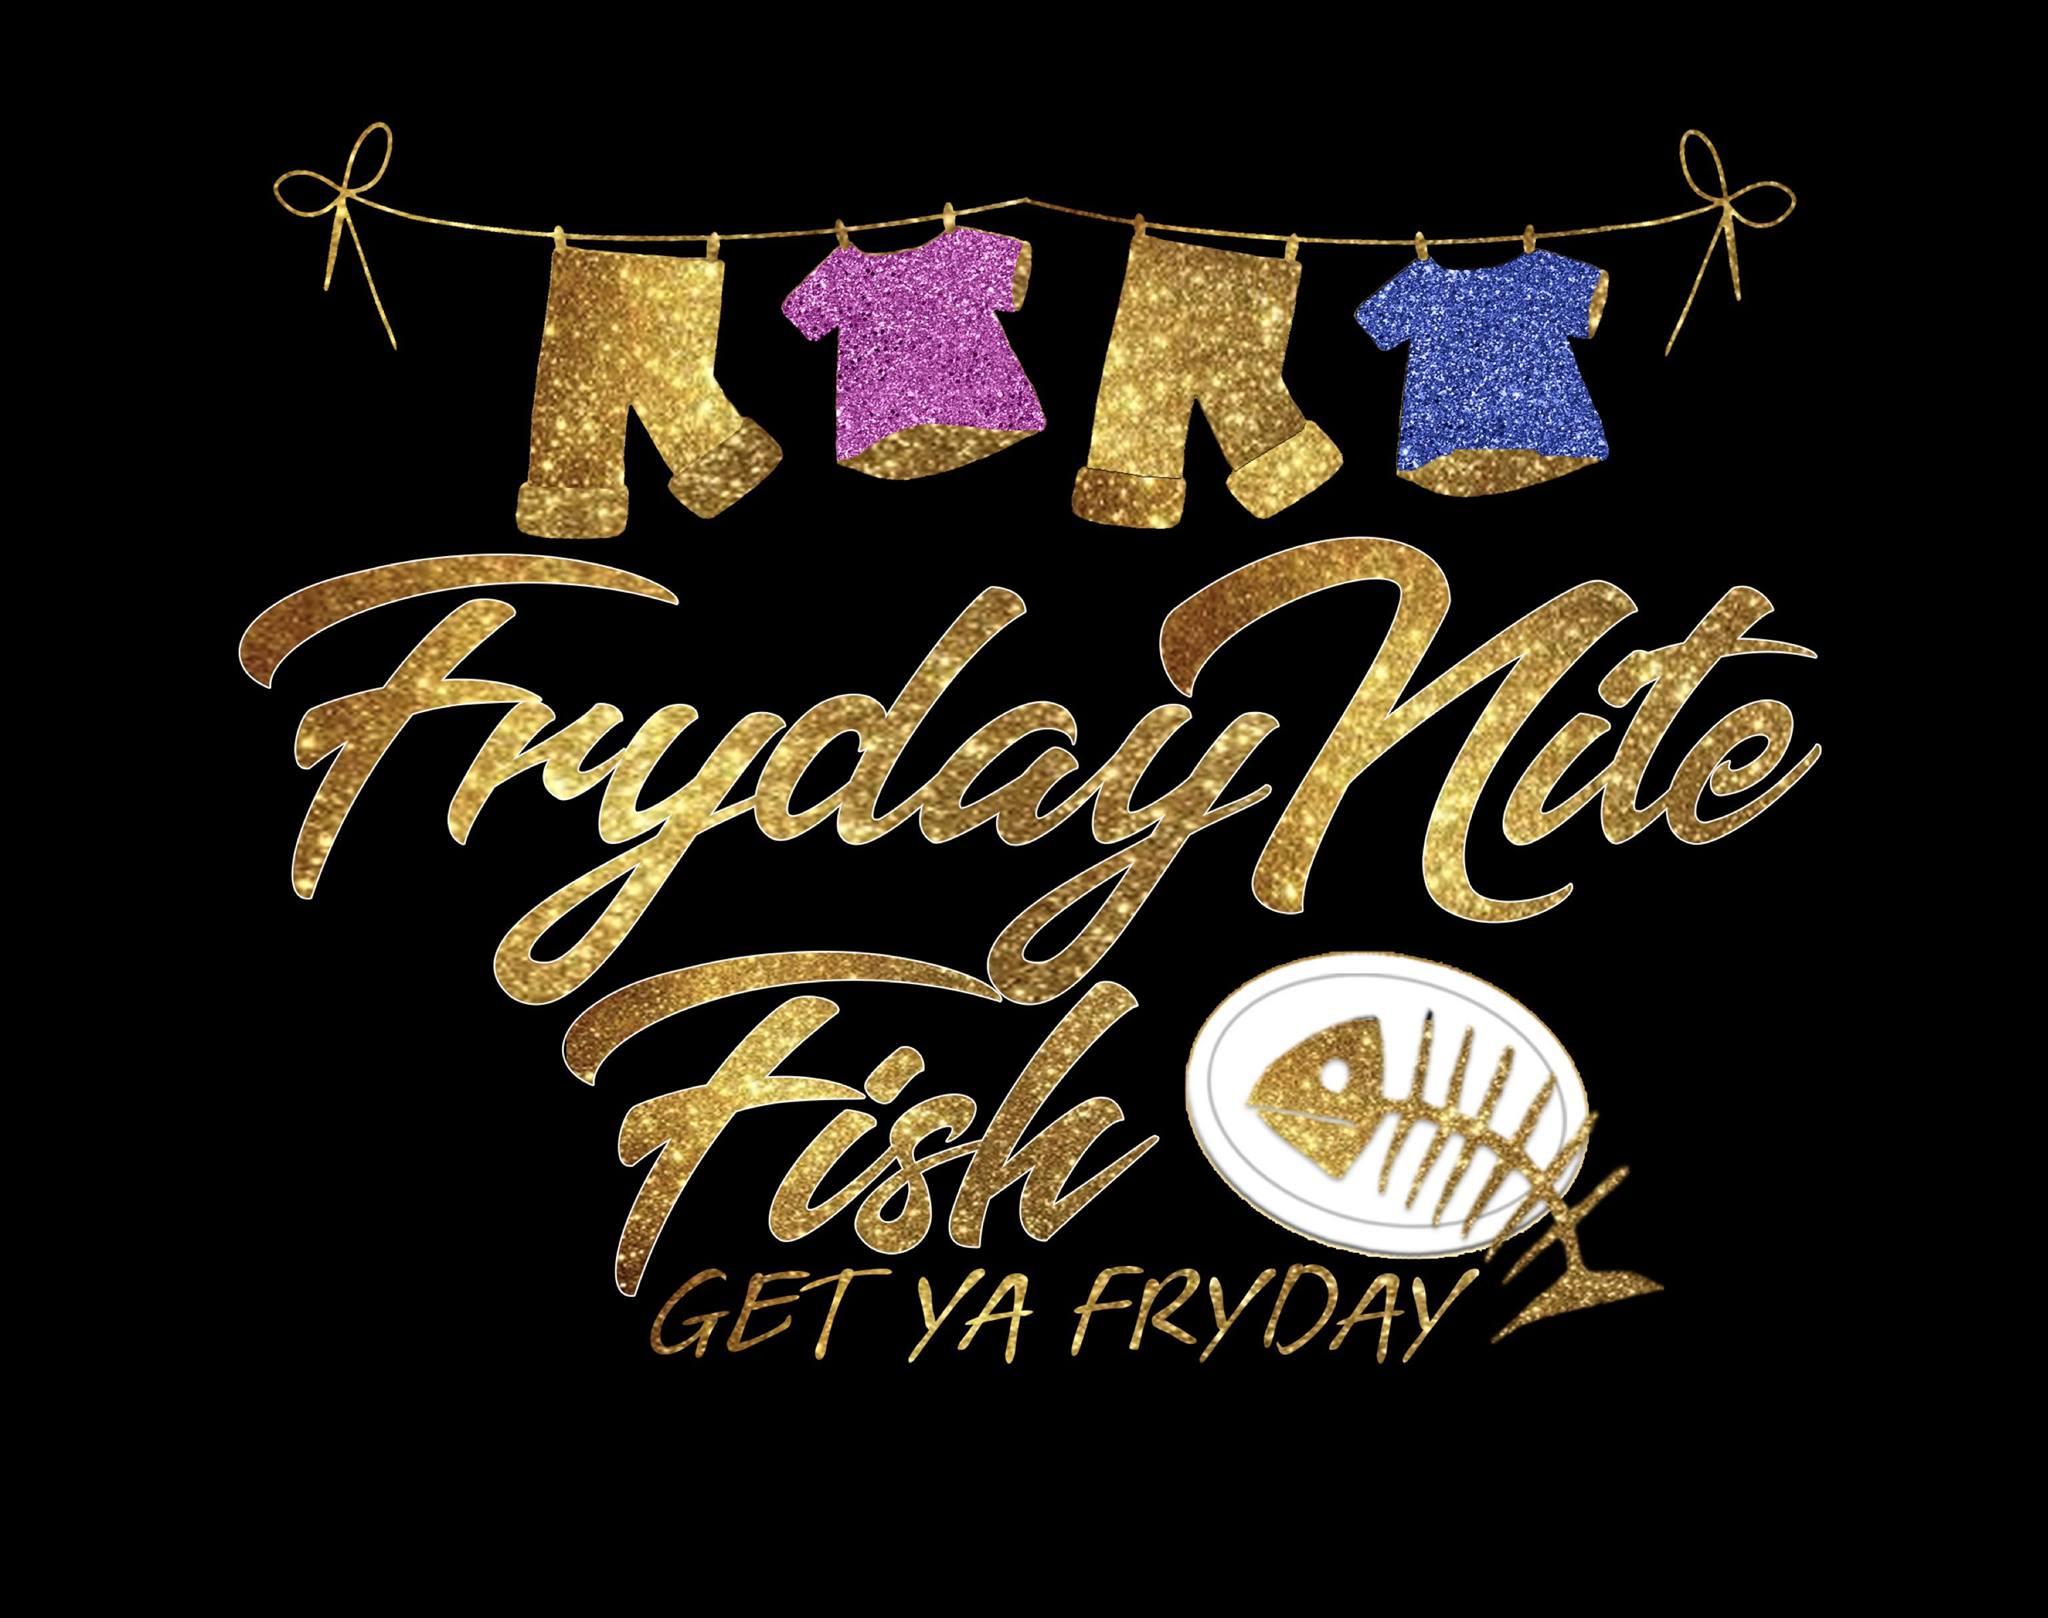 Fryday Nite Fish